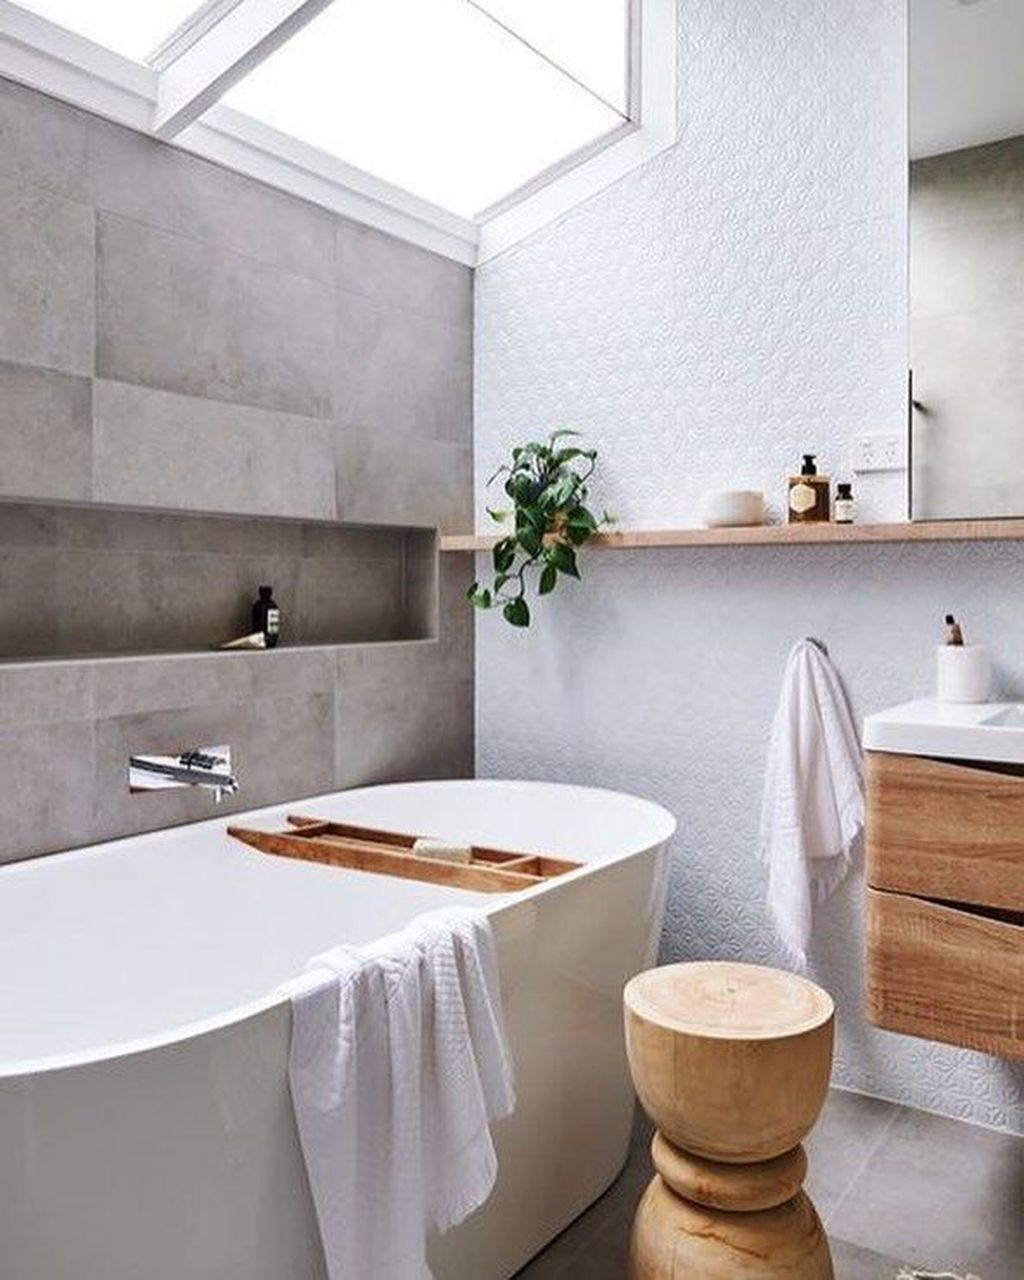 5 Gorgeous Scandinavian Bathroom Ideas: Presents For You The Best Designs About Scandinavian